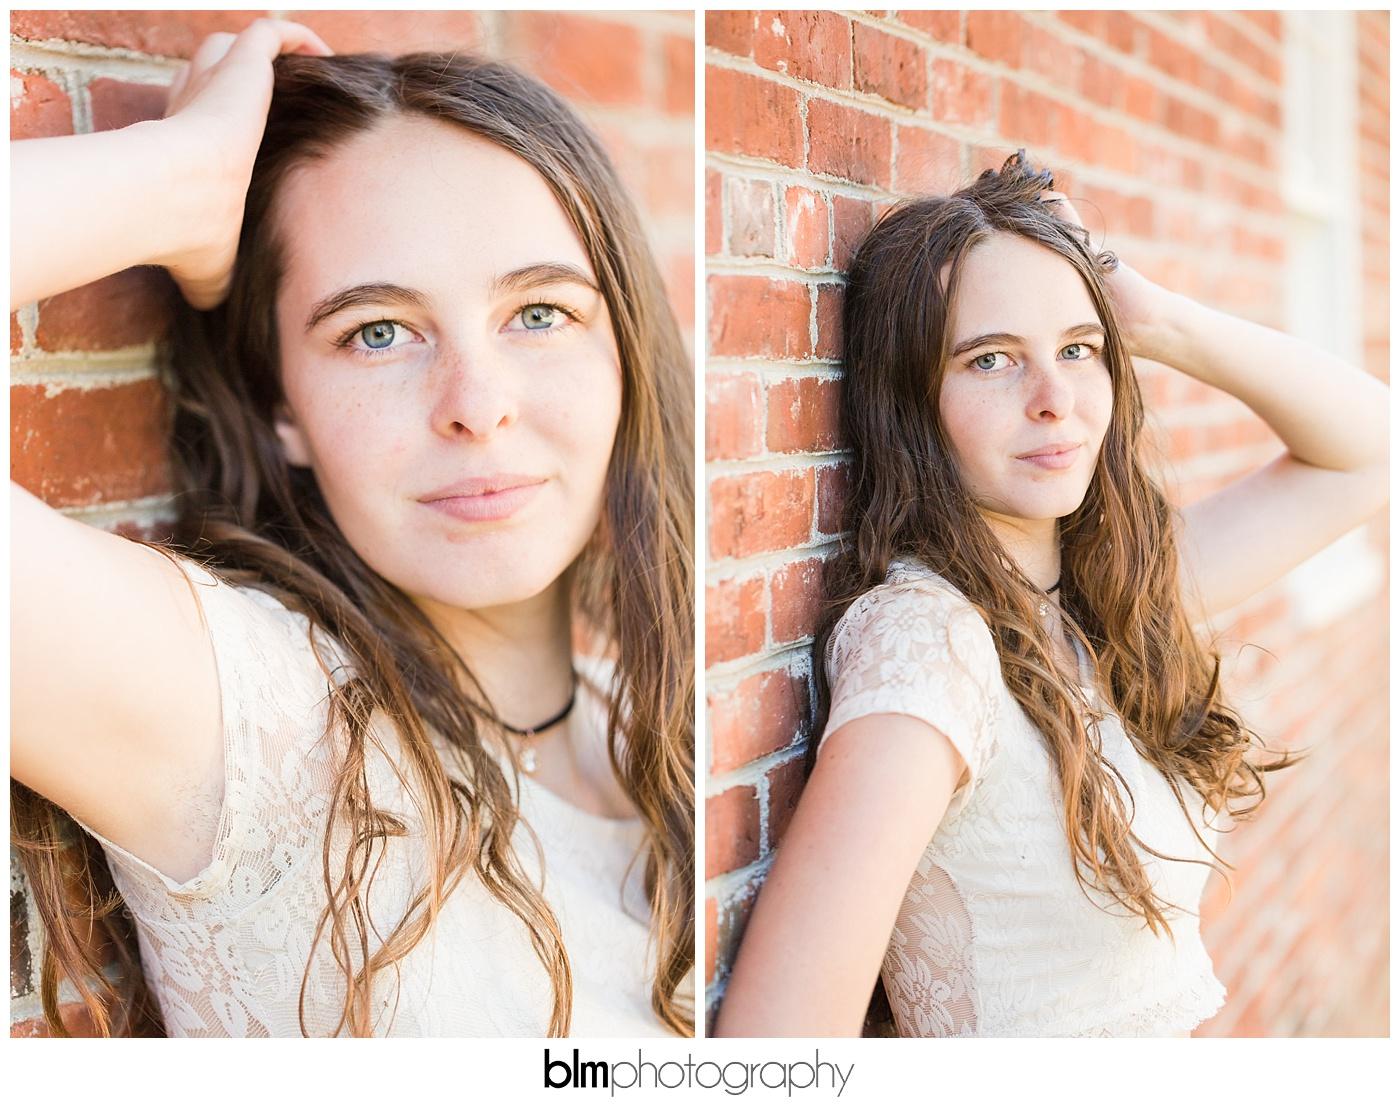 Carly-Cresta_Senior-Portraits_091516-2641.jpg